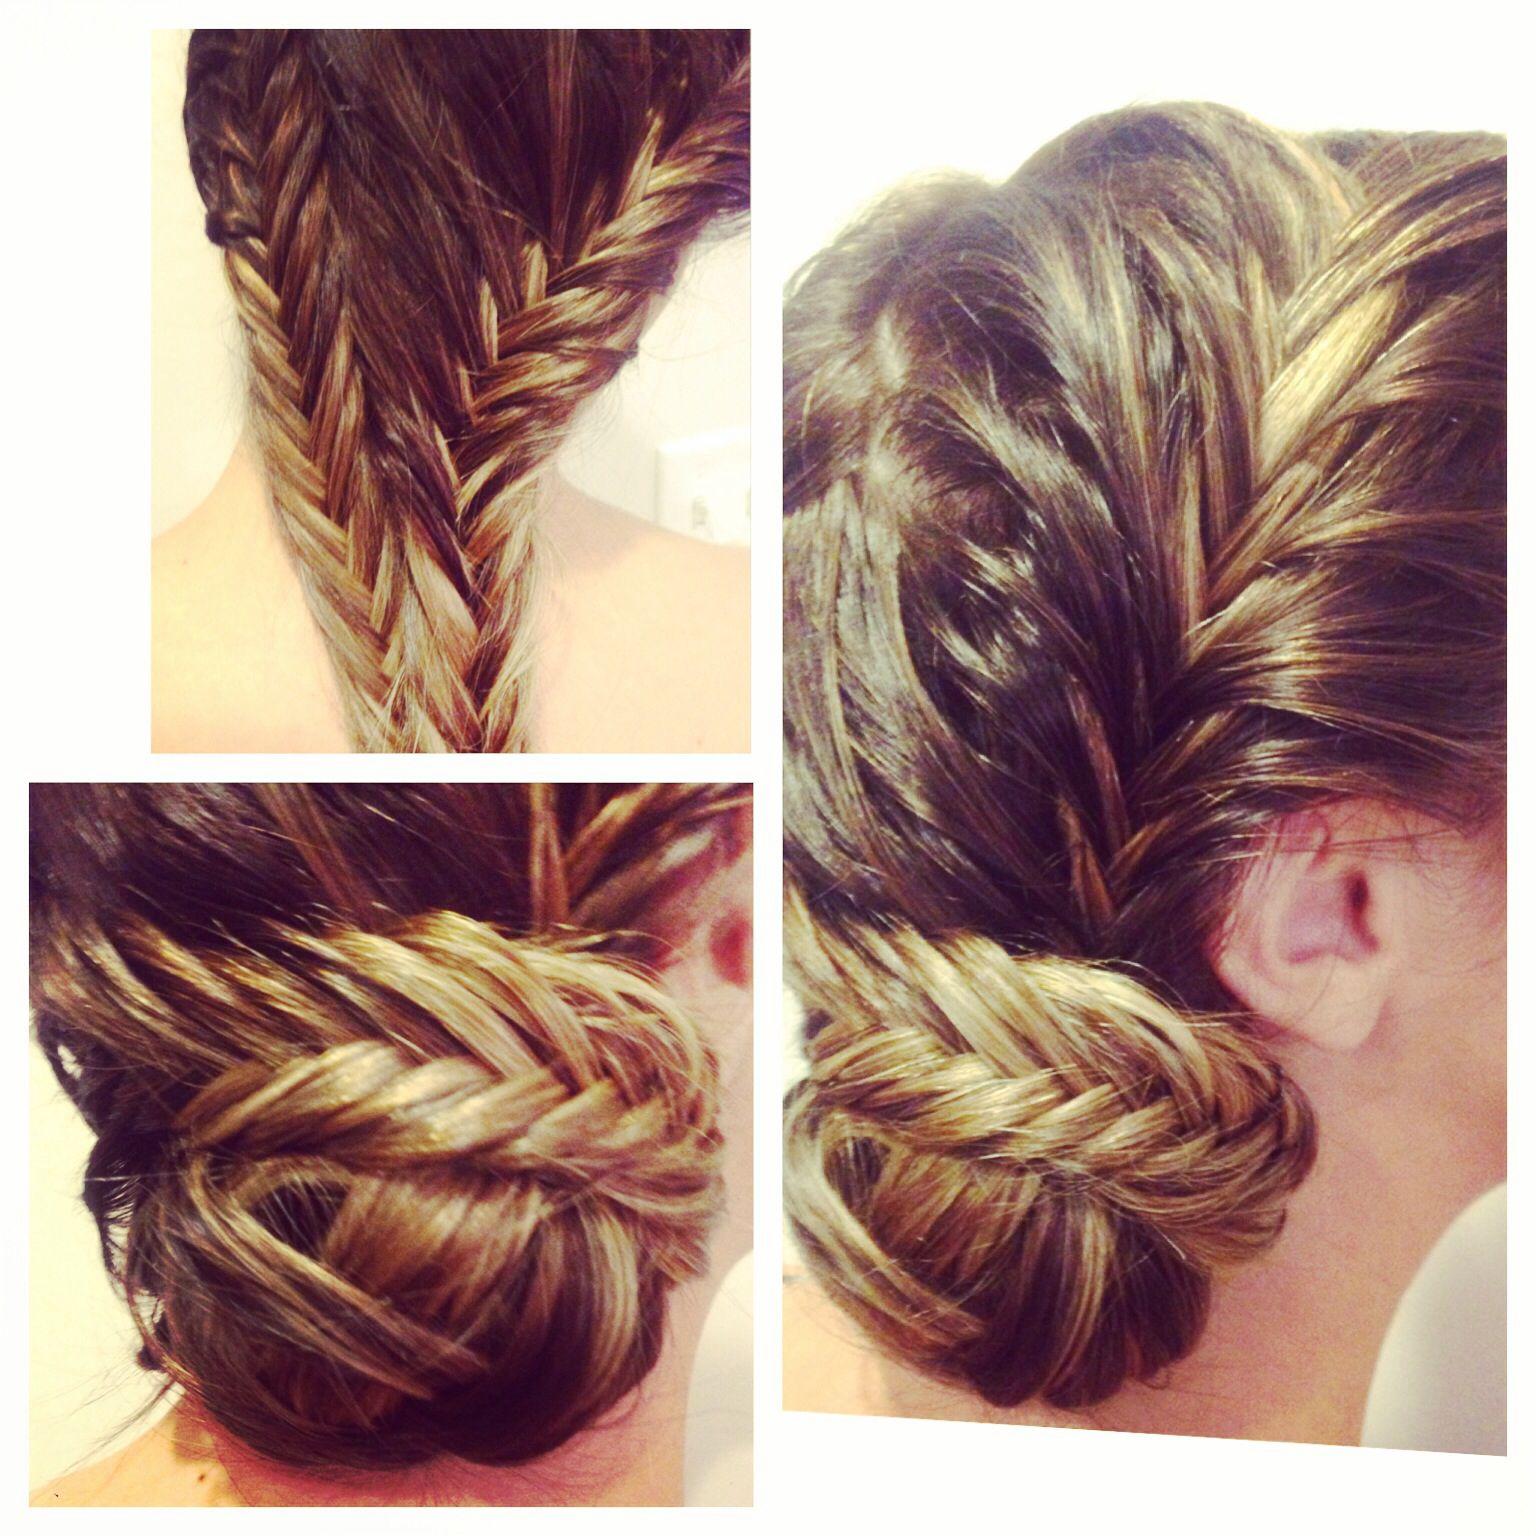 Wwwblohaute fishtail braid mobile hair app blohaute braids